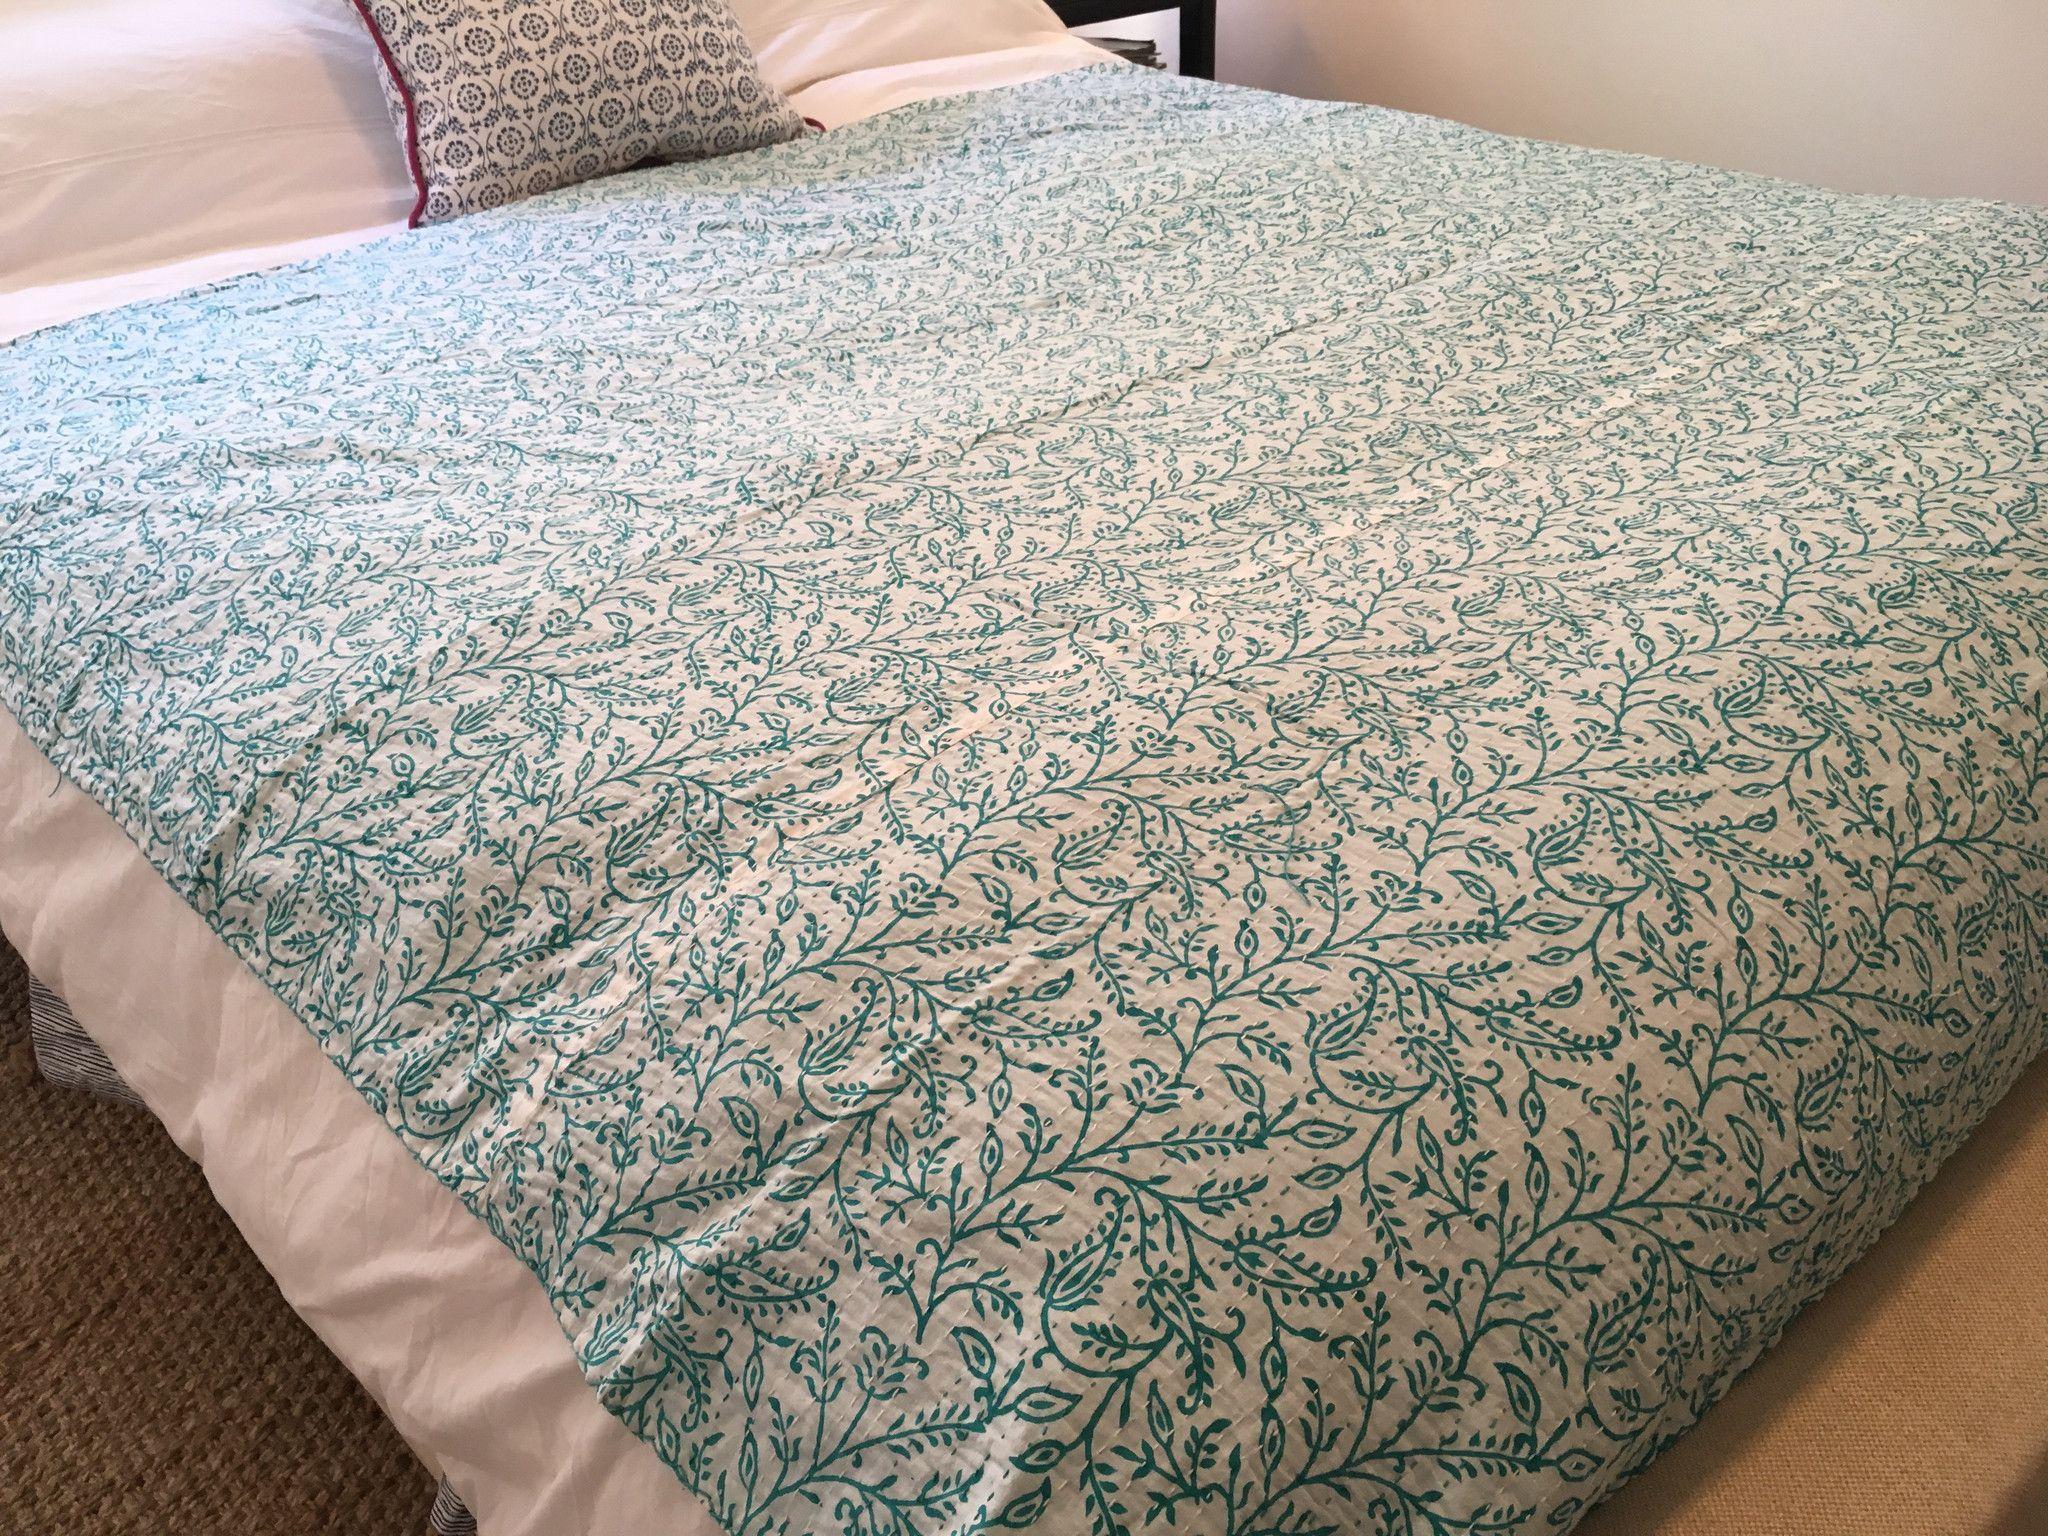 New Kantha Throw Blankets Kantha Throw Blanket Kantha Throw Kantha